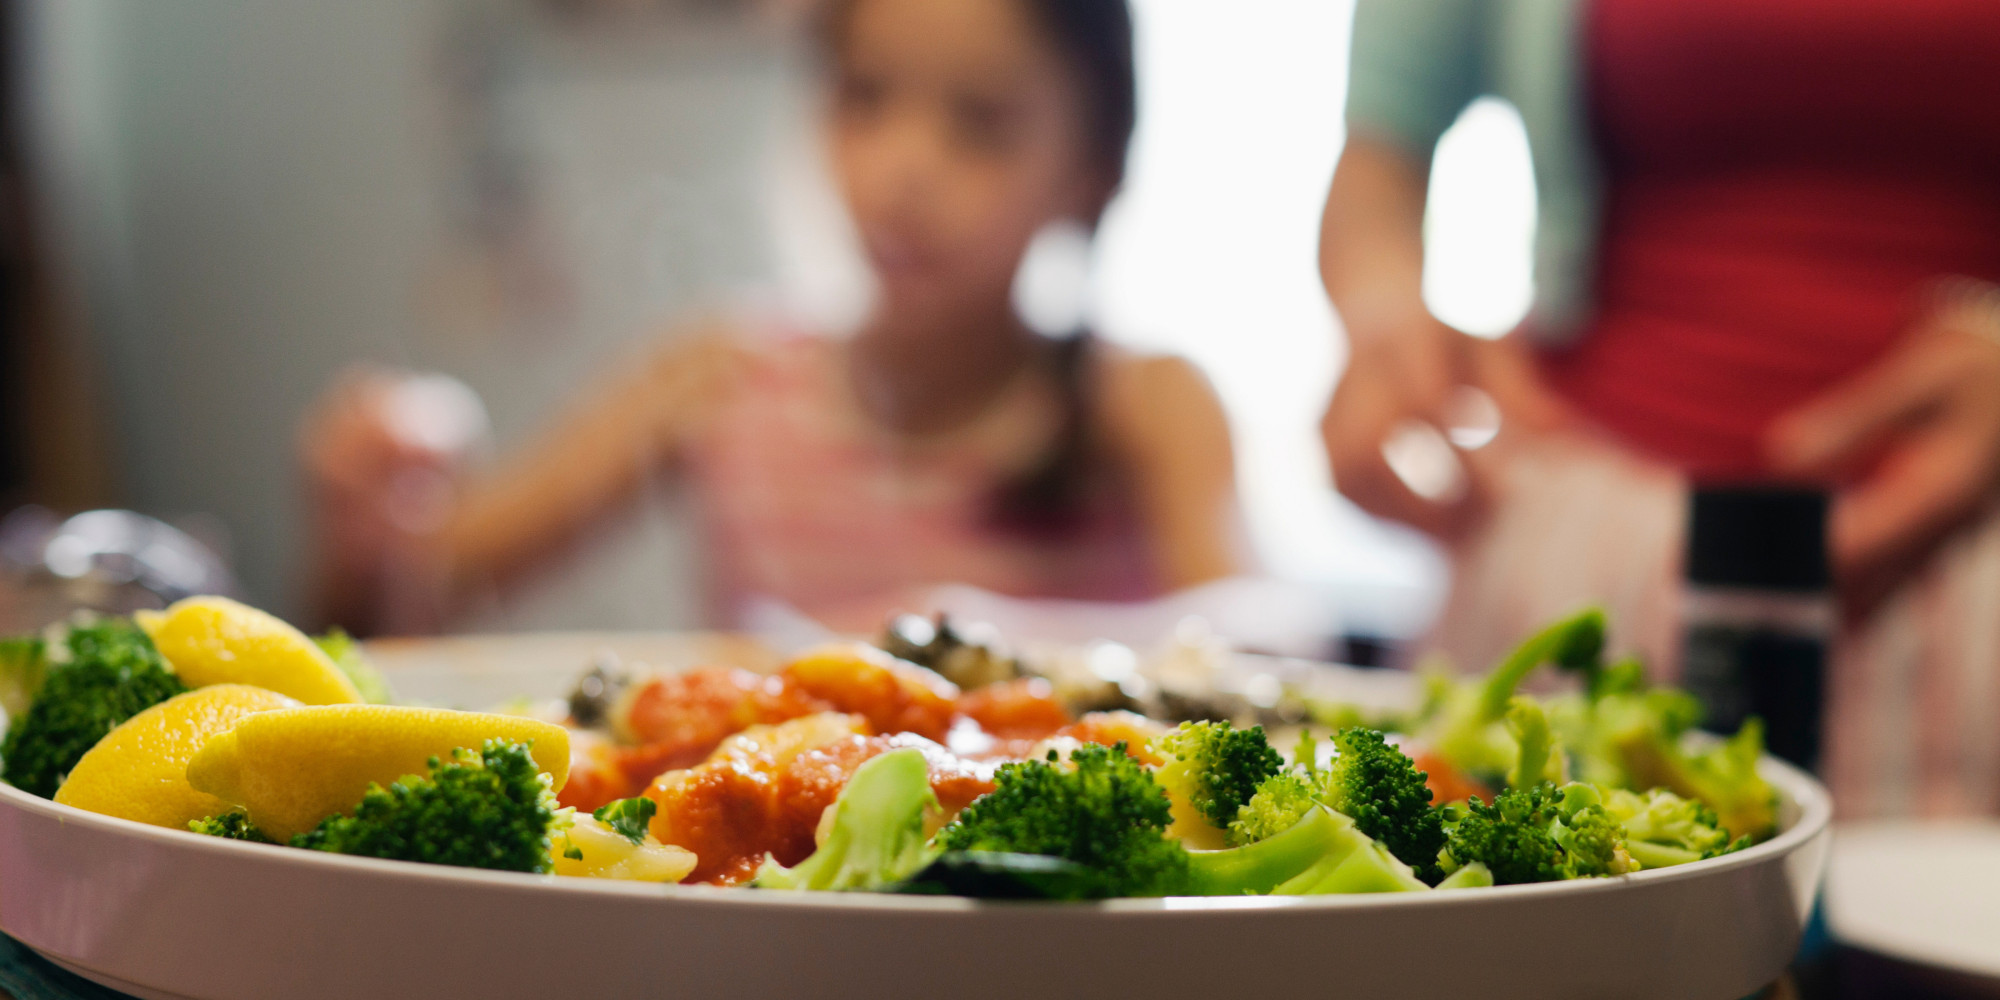 o-eating-healthy-facebook.jpg